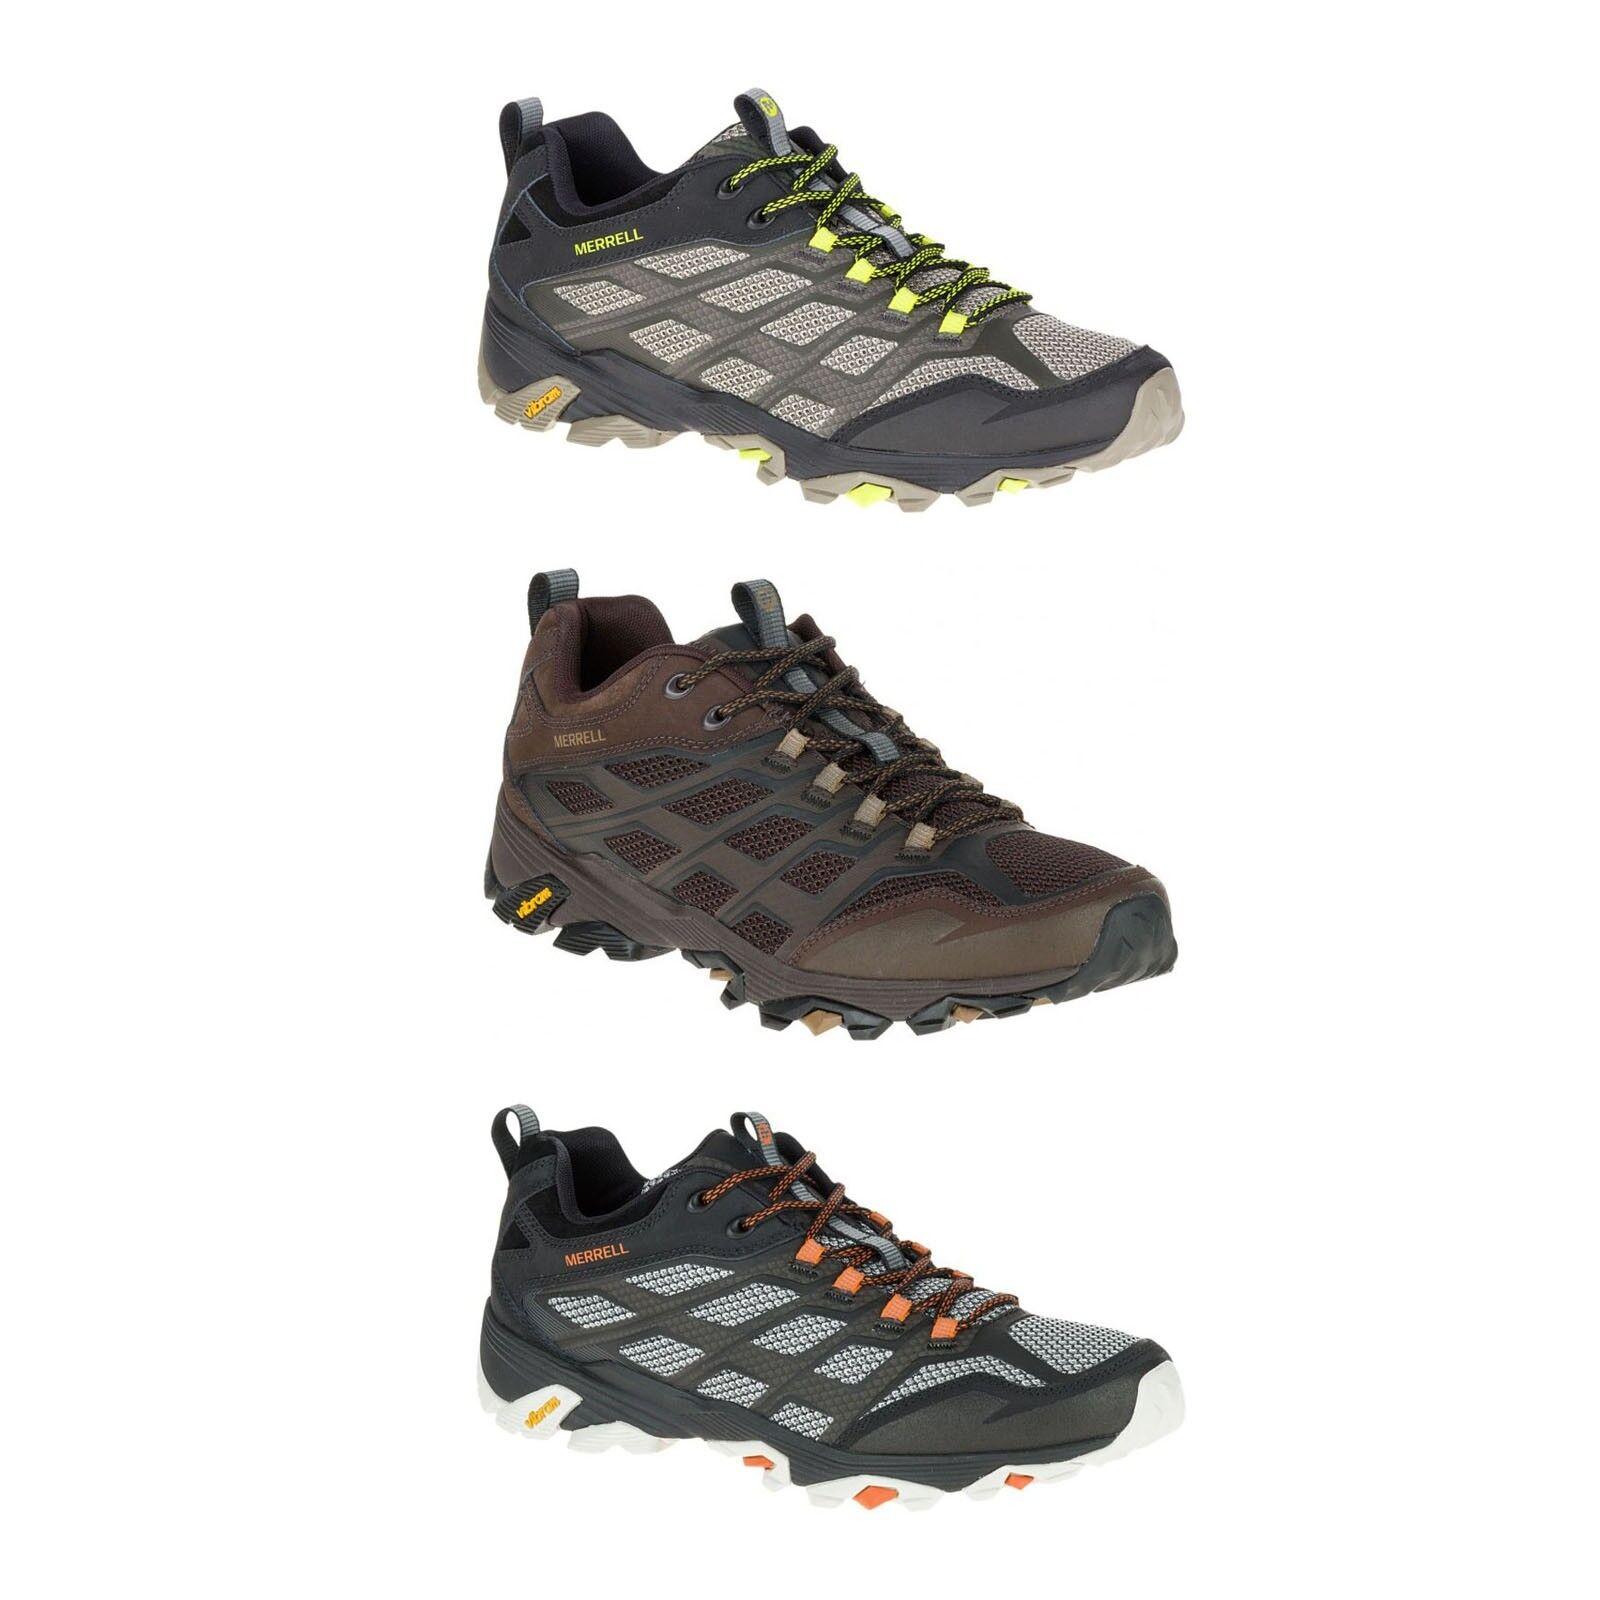 New Authentic Merrell Vibram Moab FST Men's Medium Vibram Merrell Hiking Trail Shoes All Sizes 667fd6